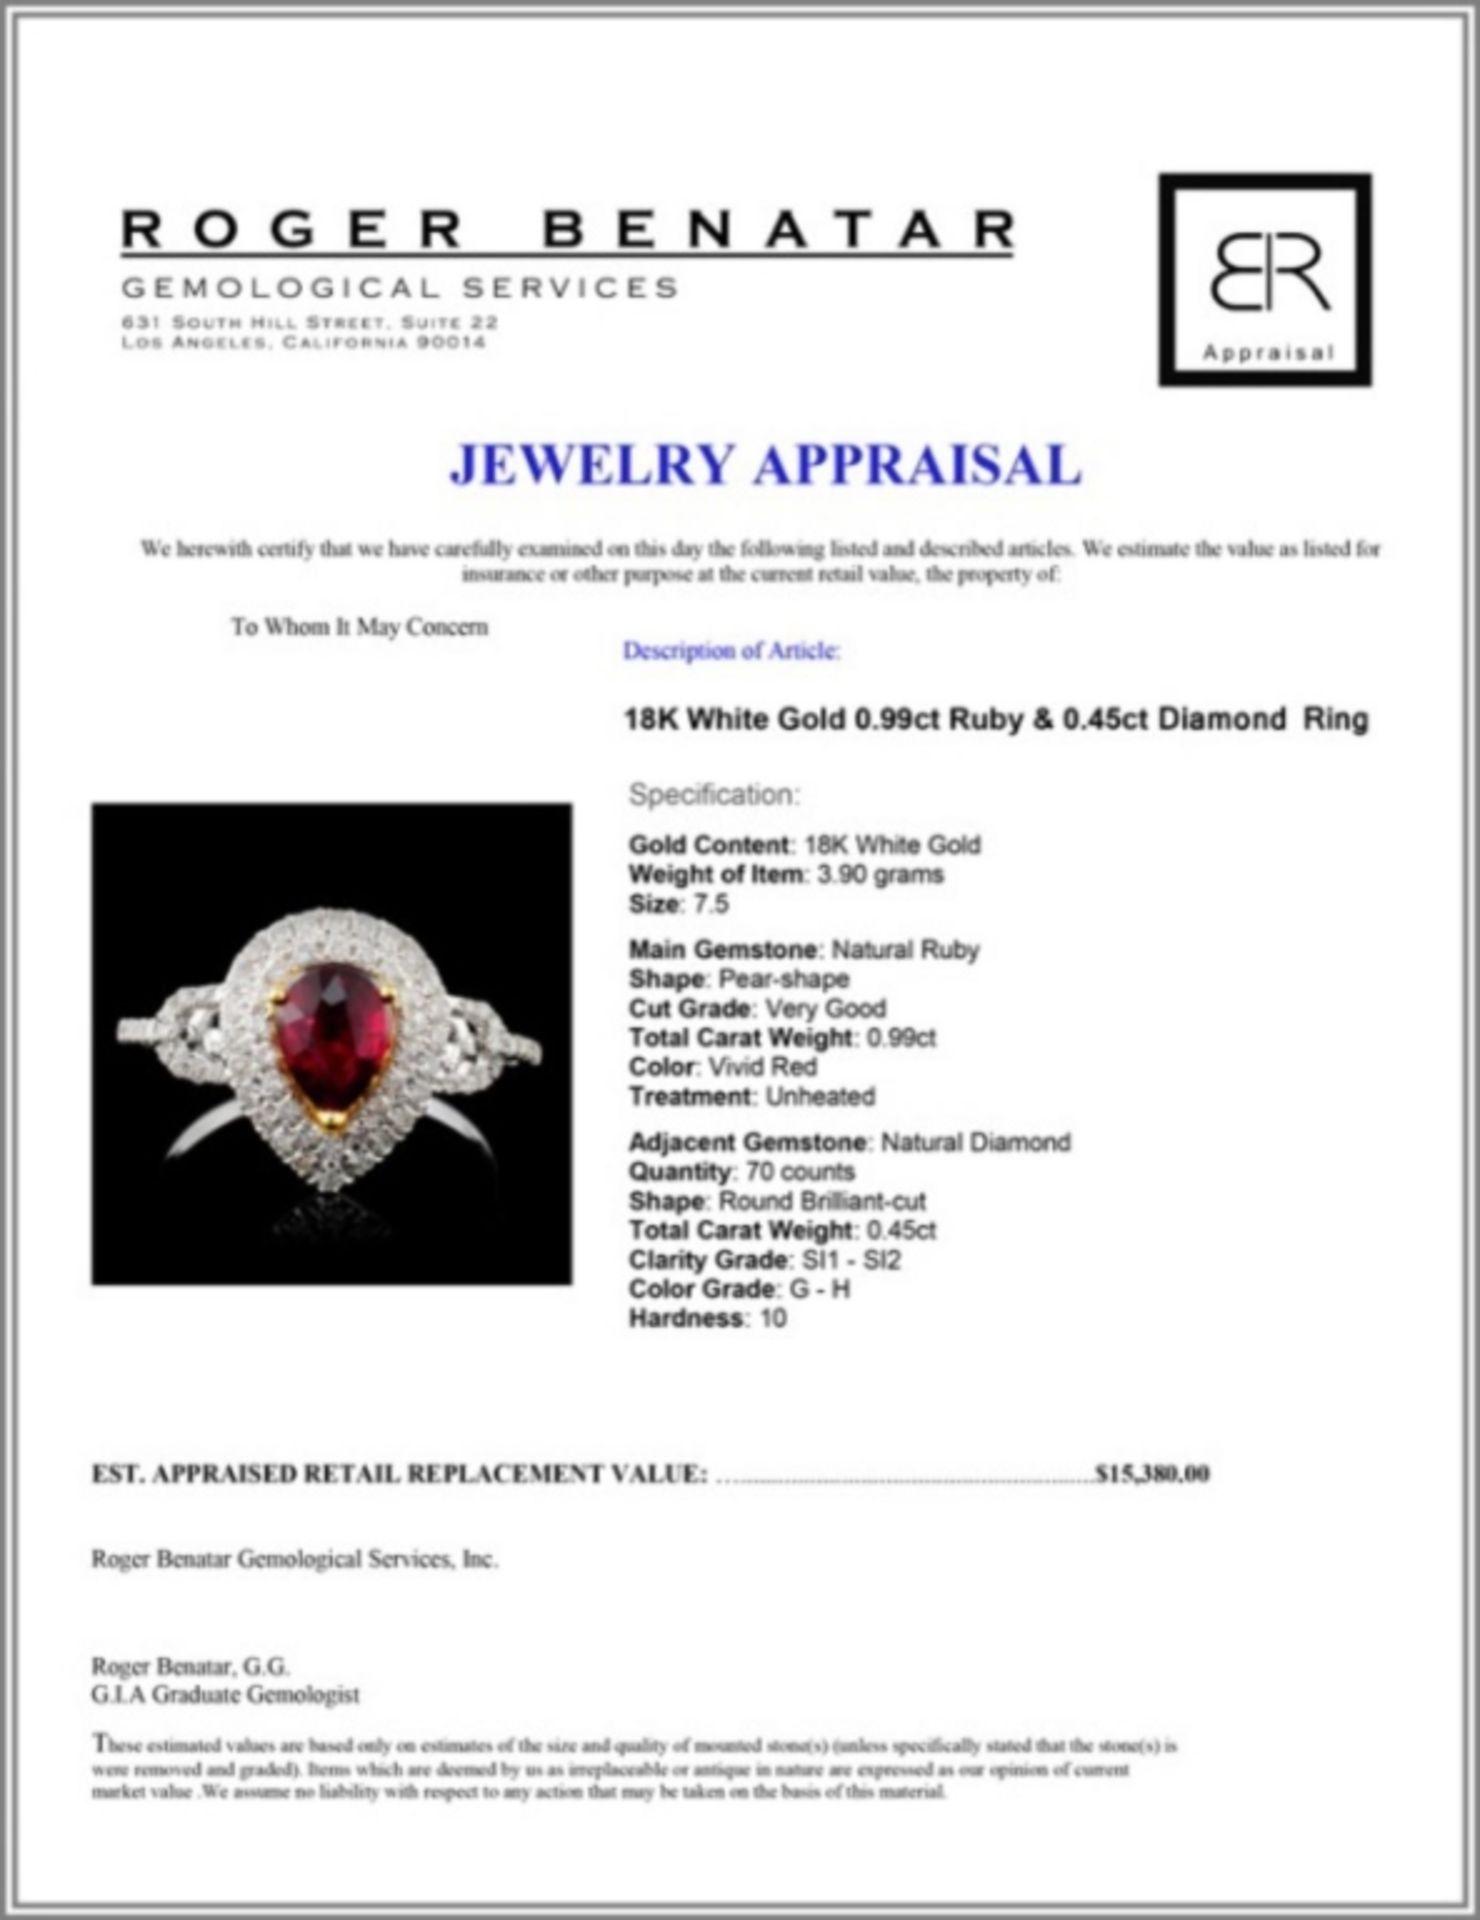 18K White Gold 0.99ct Ruby & 0.45ct Diamond Ring - Image 4 of 4